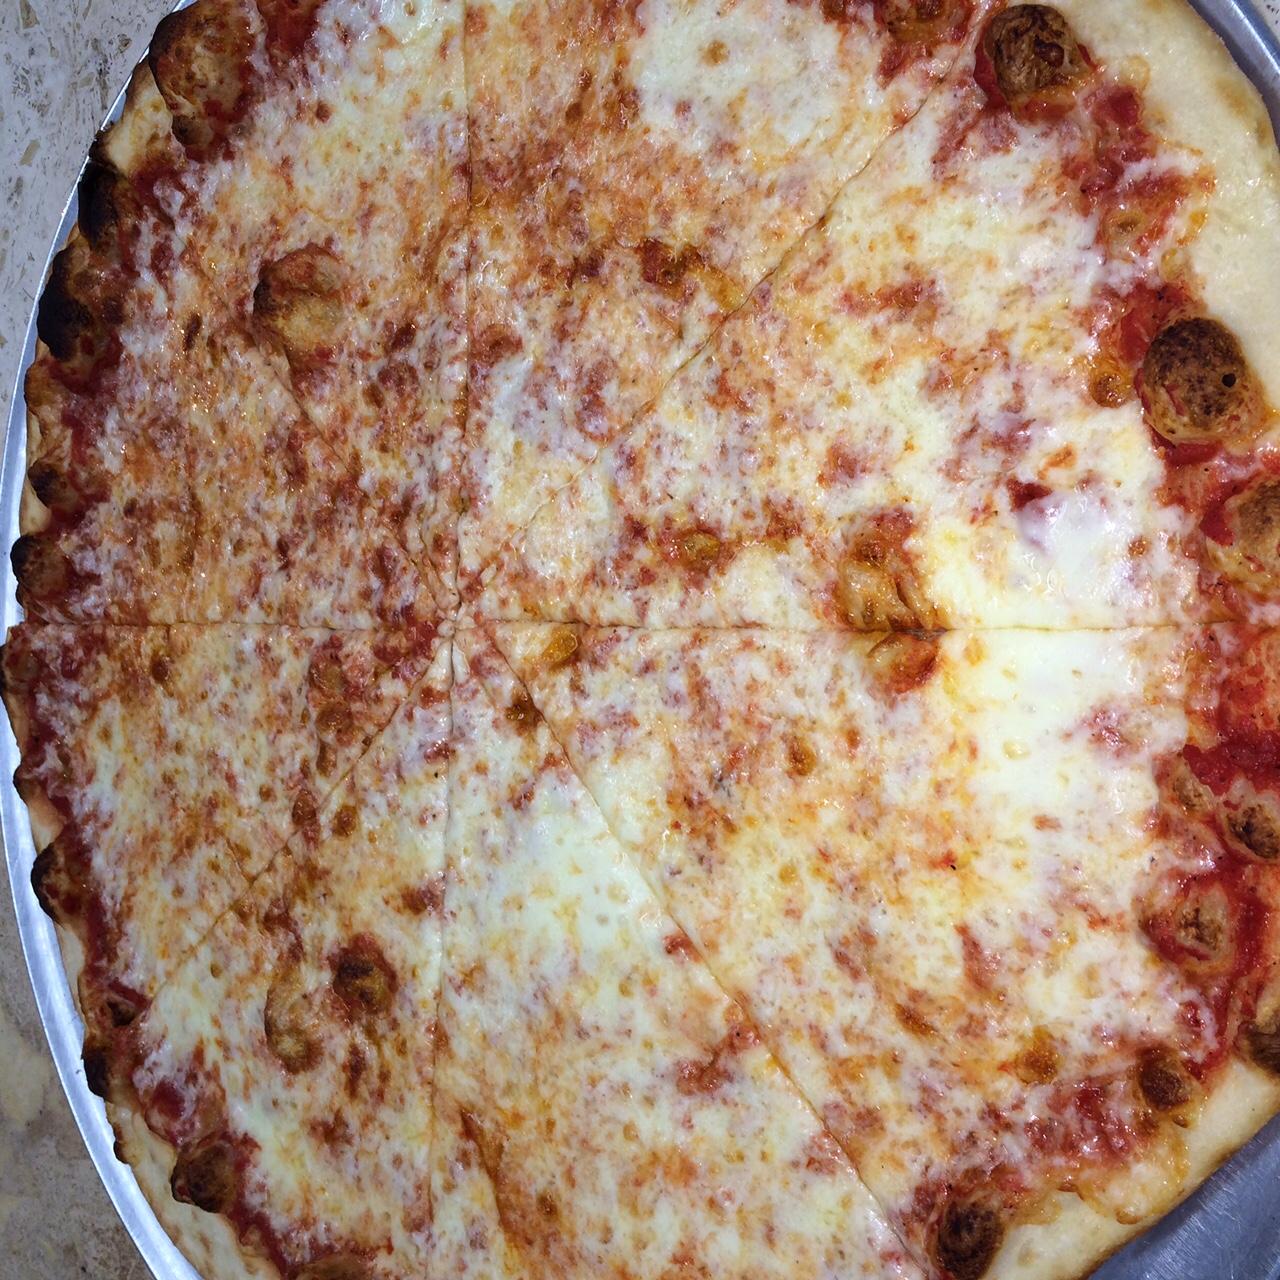 bc37acc29dde97e5a574_Coles_pizza.jpg